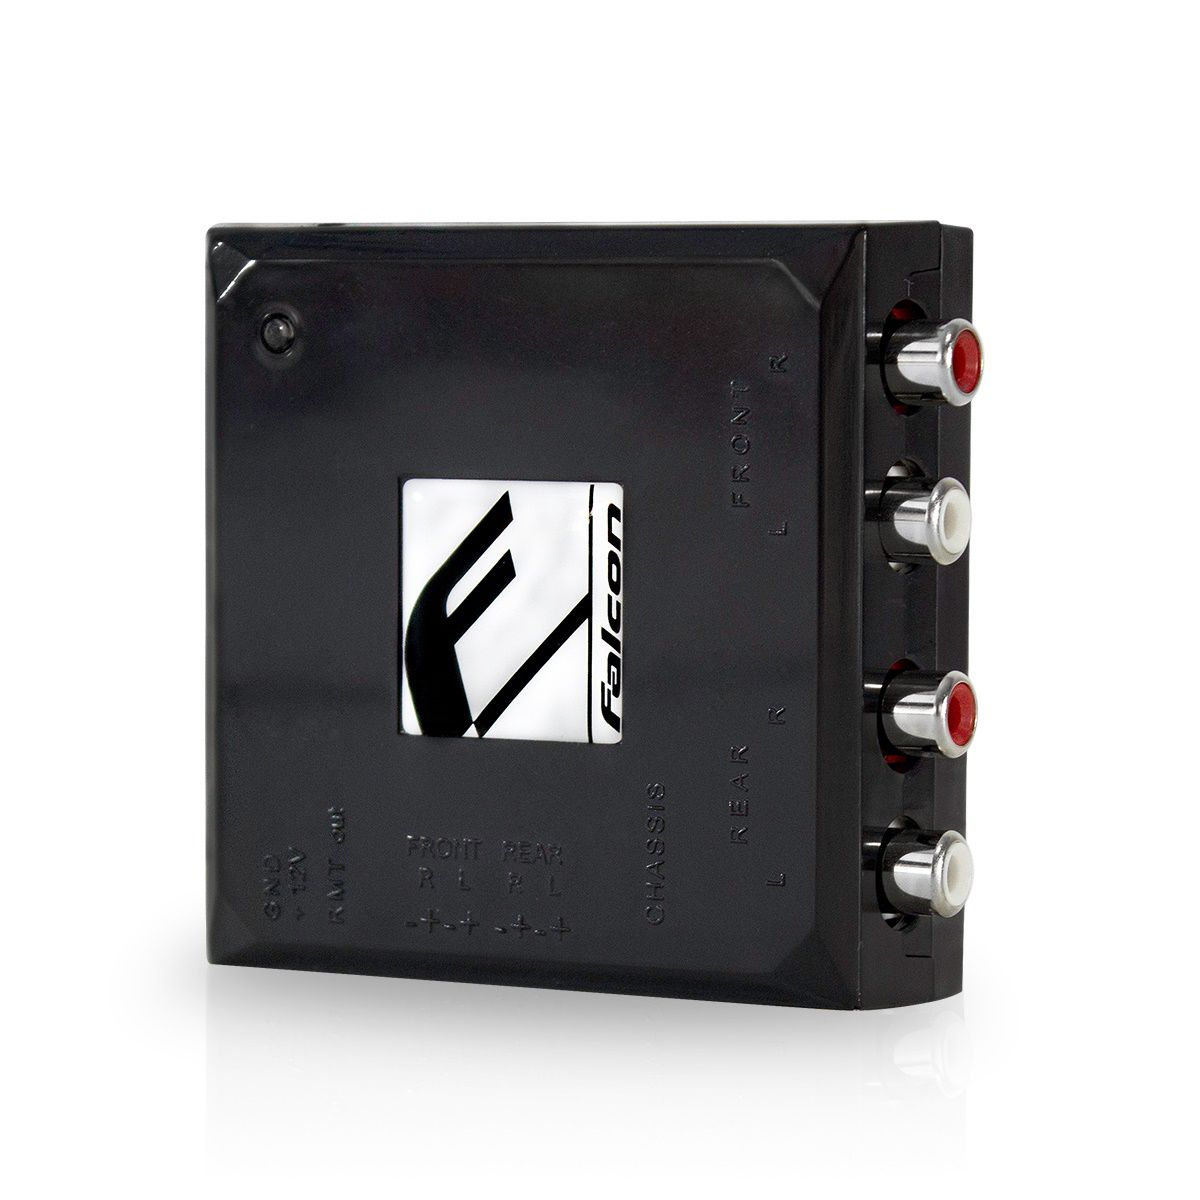 Conversor Adaptador de fio para Rca com Anti Ruido Falcon FCX 4 Entradas e 4 Saidas